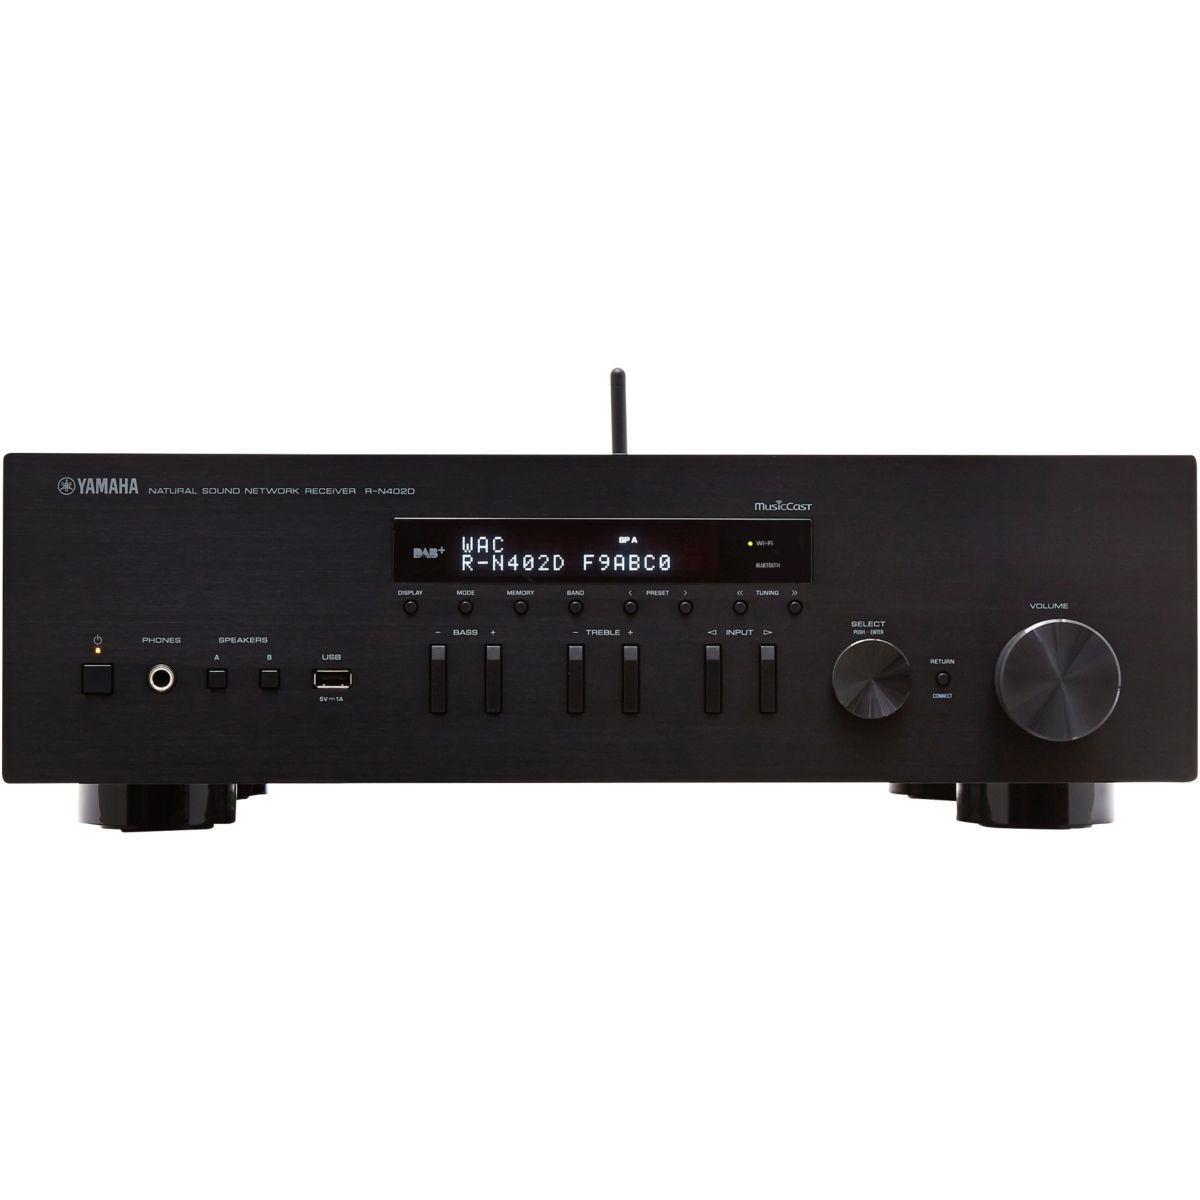 Amplificateur hifi yamaha musiccast rn402 noir - livraison offerte : code livdom (photo)